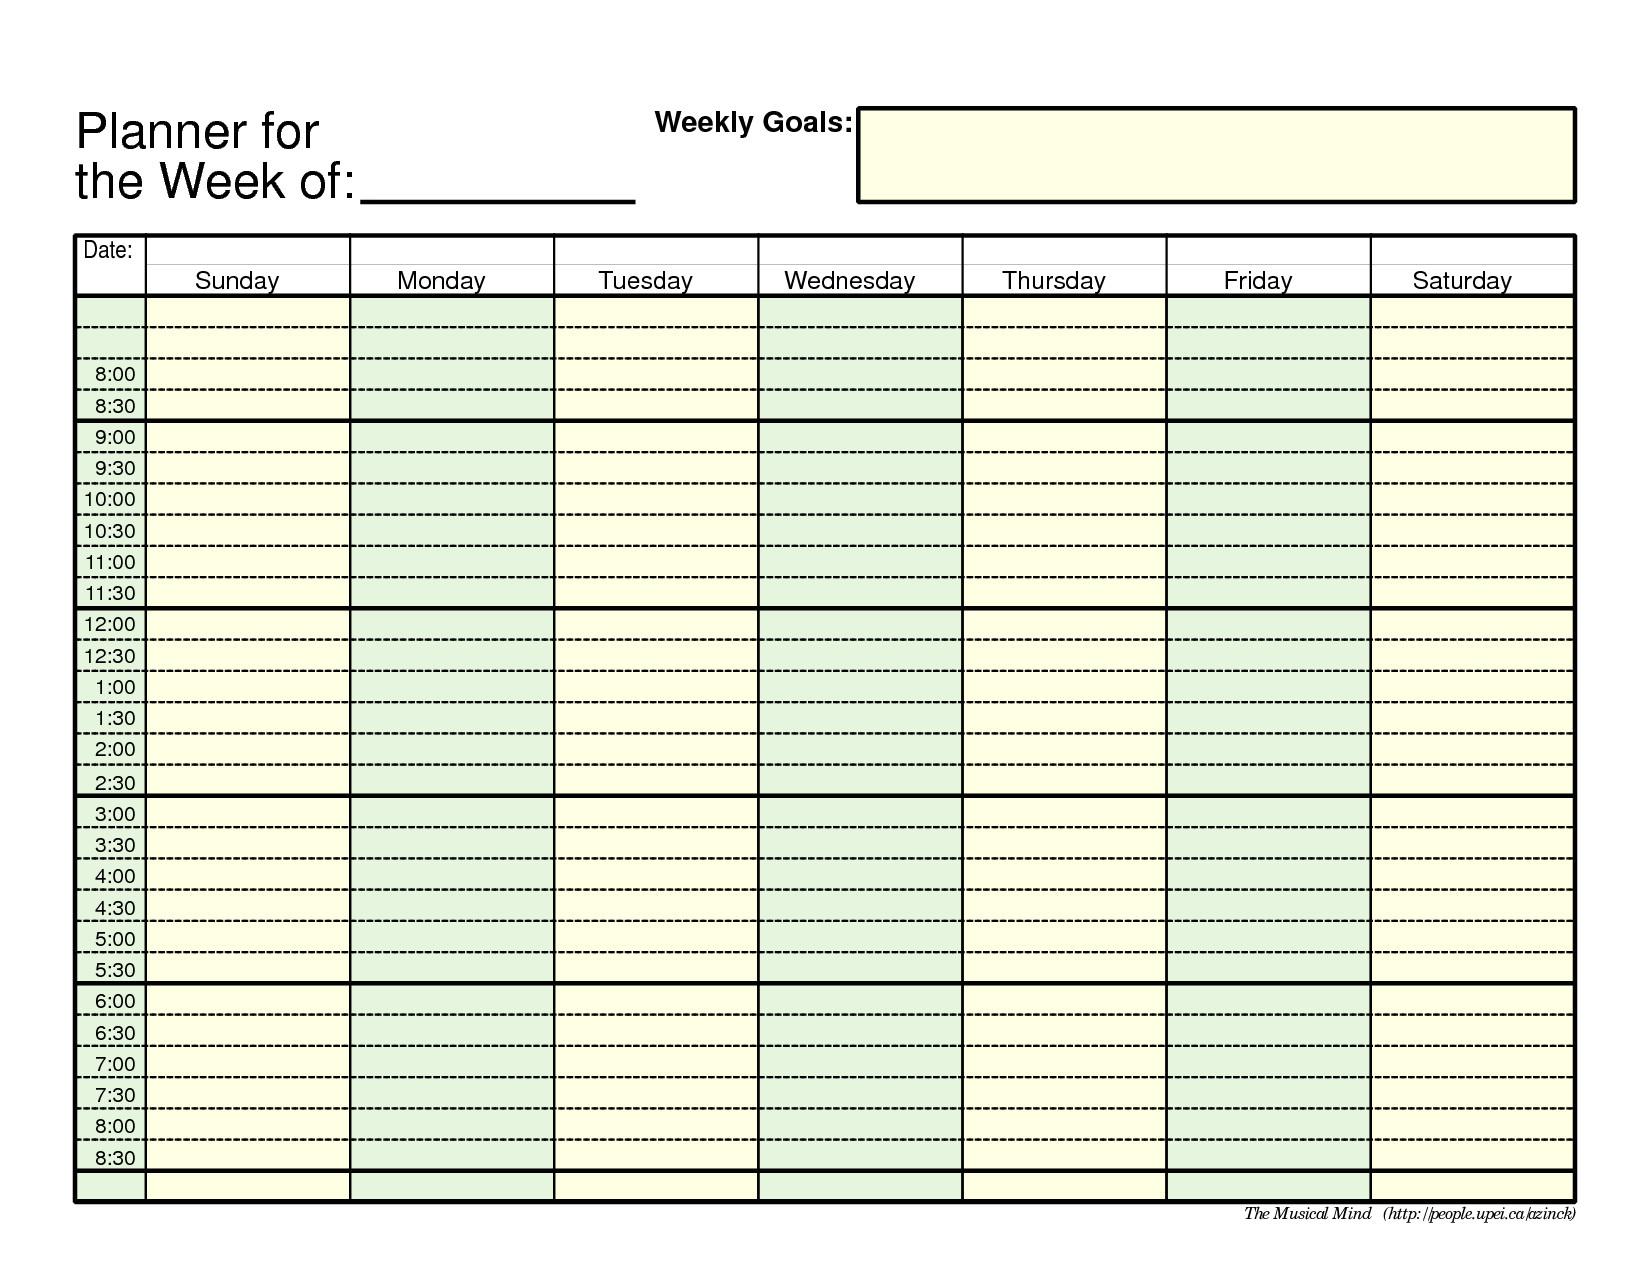 weeklyplannertemplate net